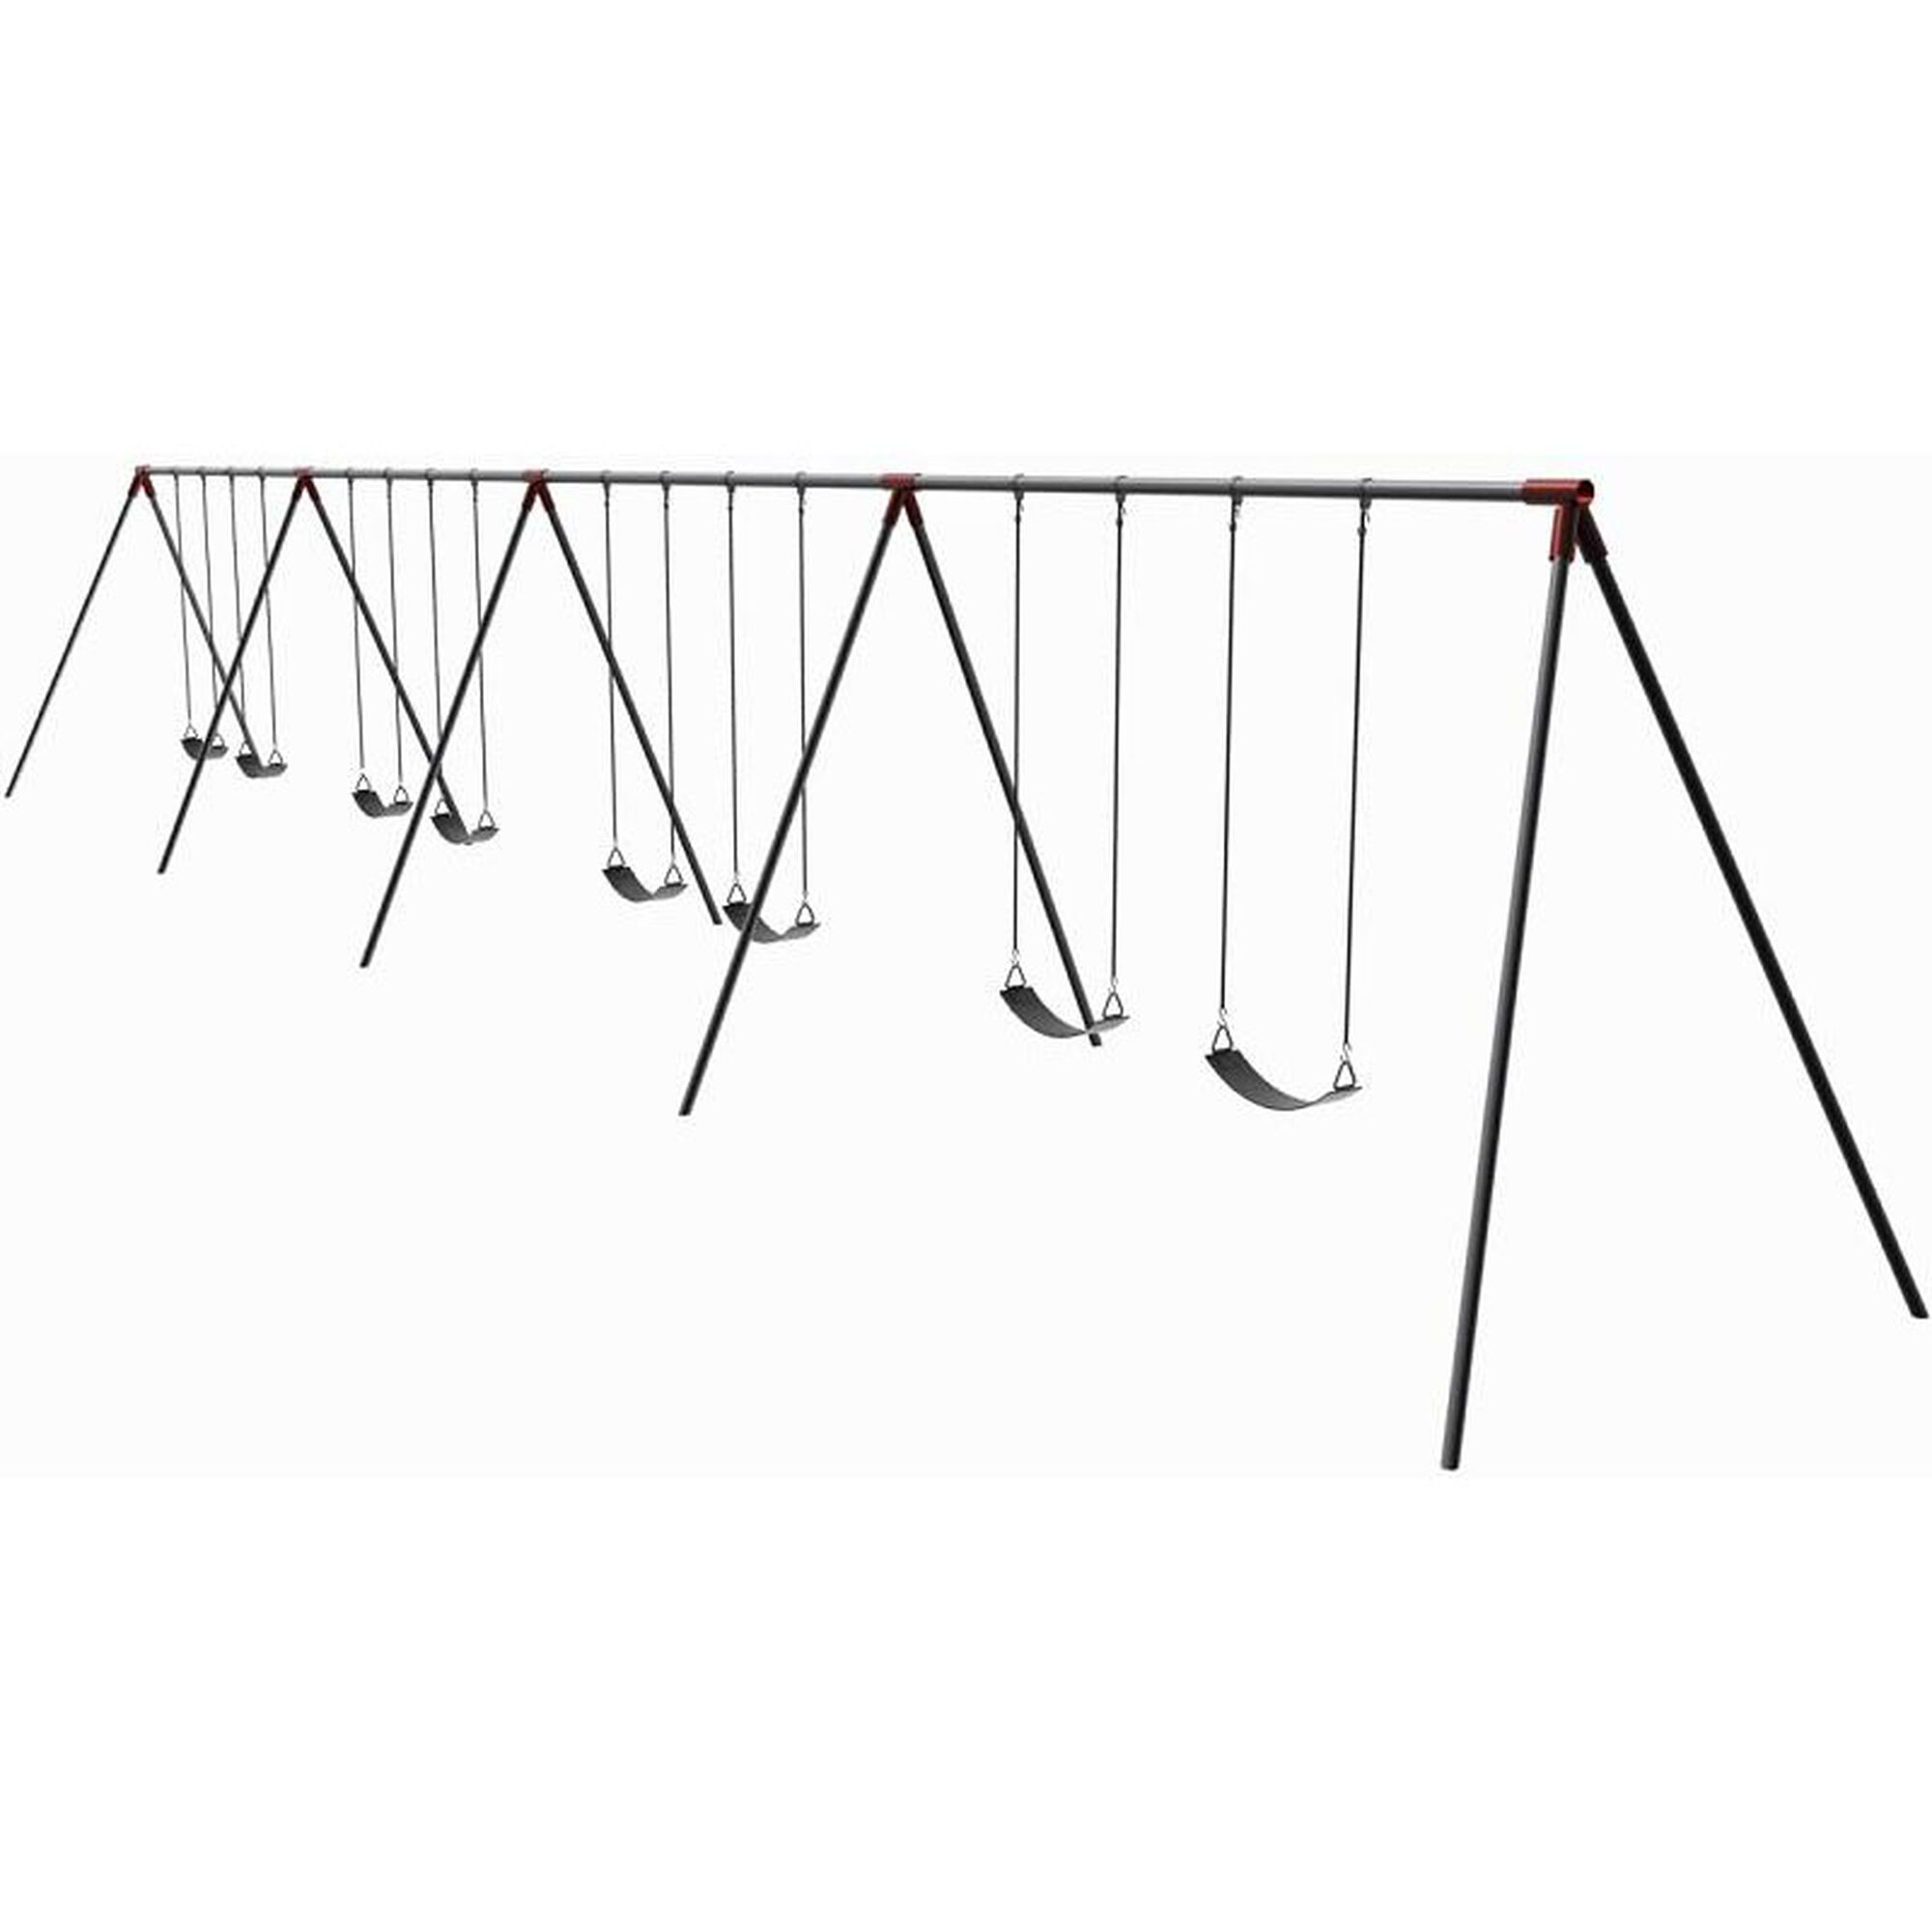 8 Seat Primary Bipod Swing Set 581 818x Bizchair Com